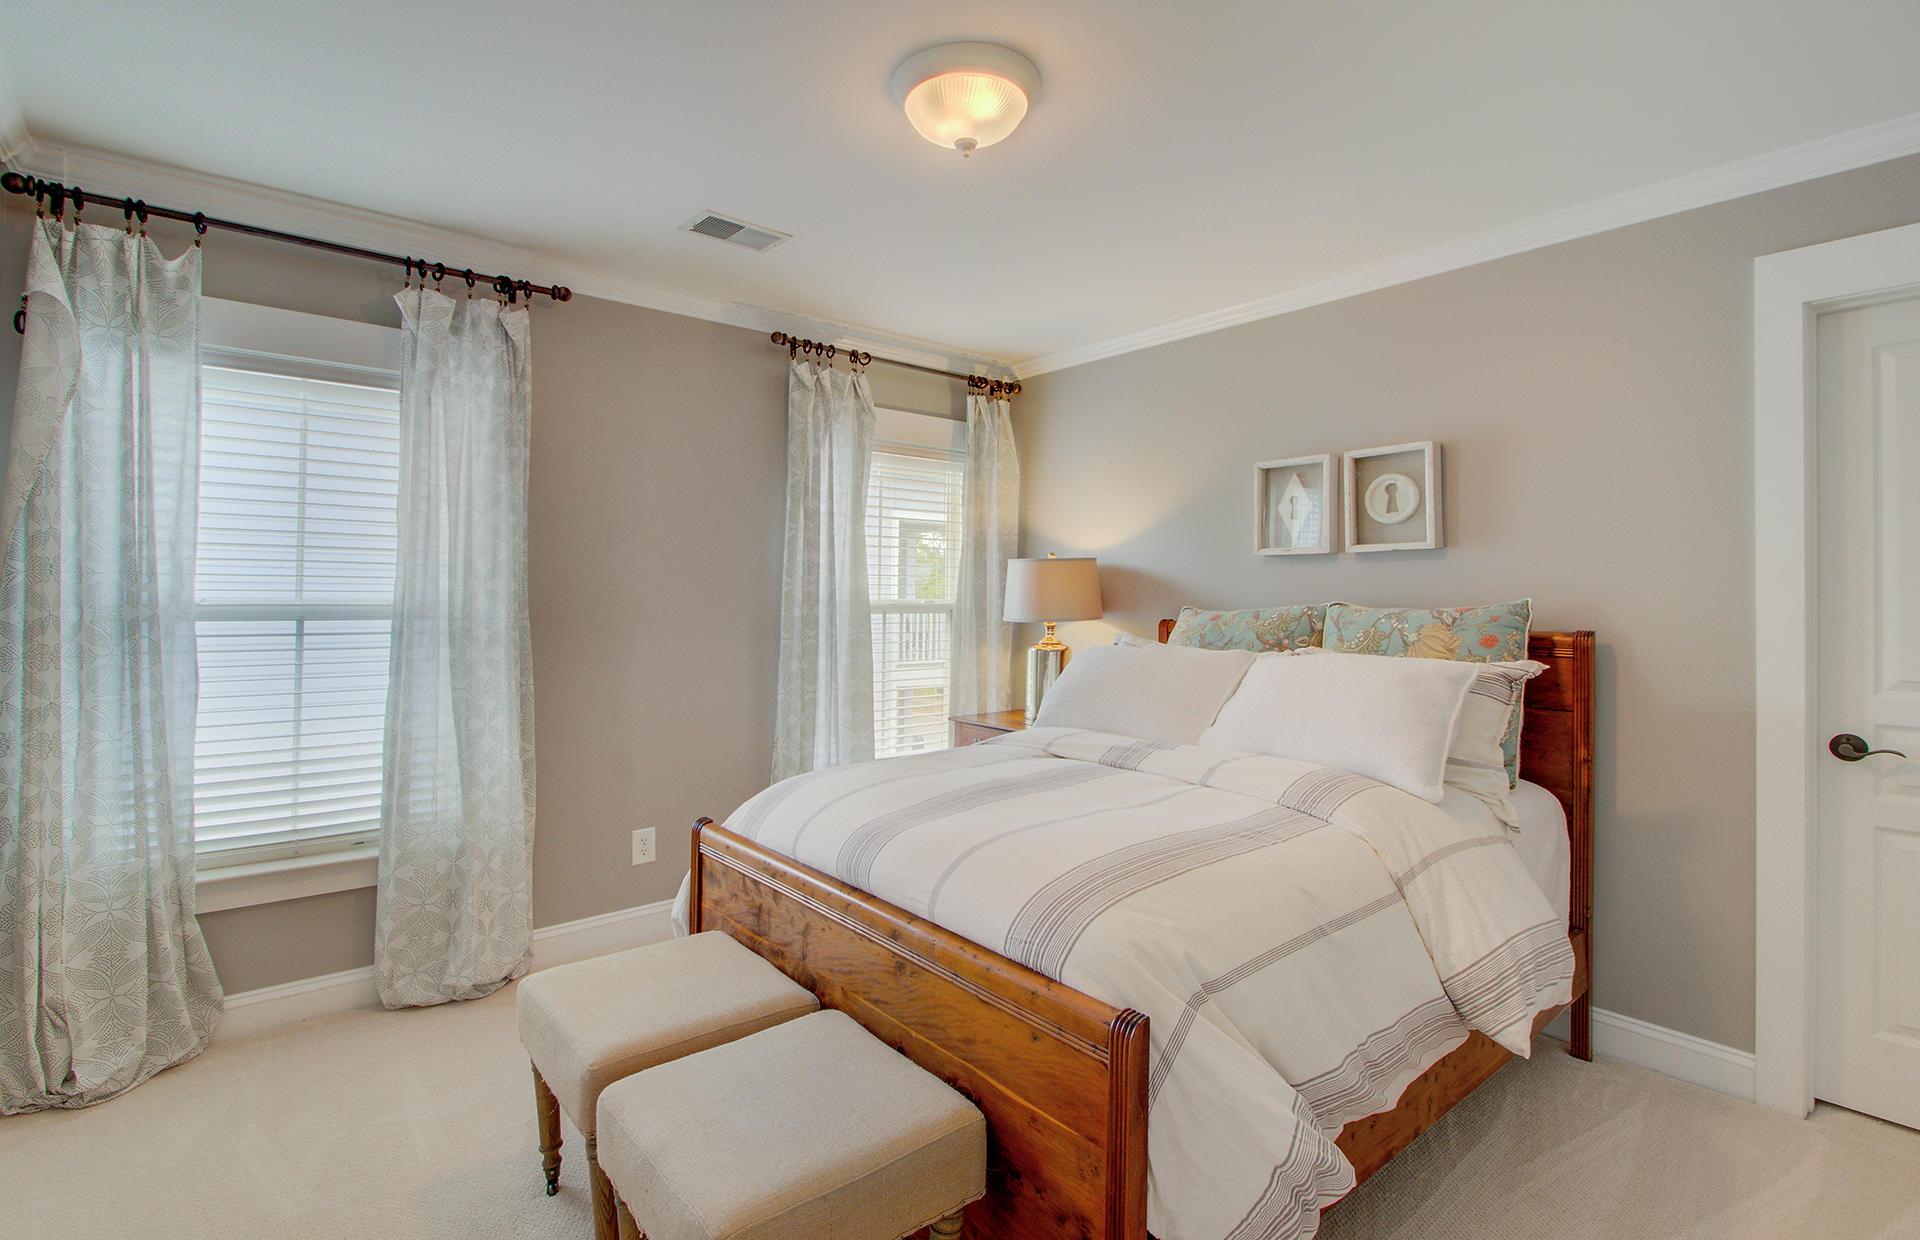 New Parrish Village Homes For Sale - 1109 Dawn View, Mount Pleasant, SC - 32